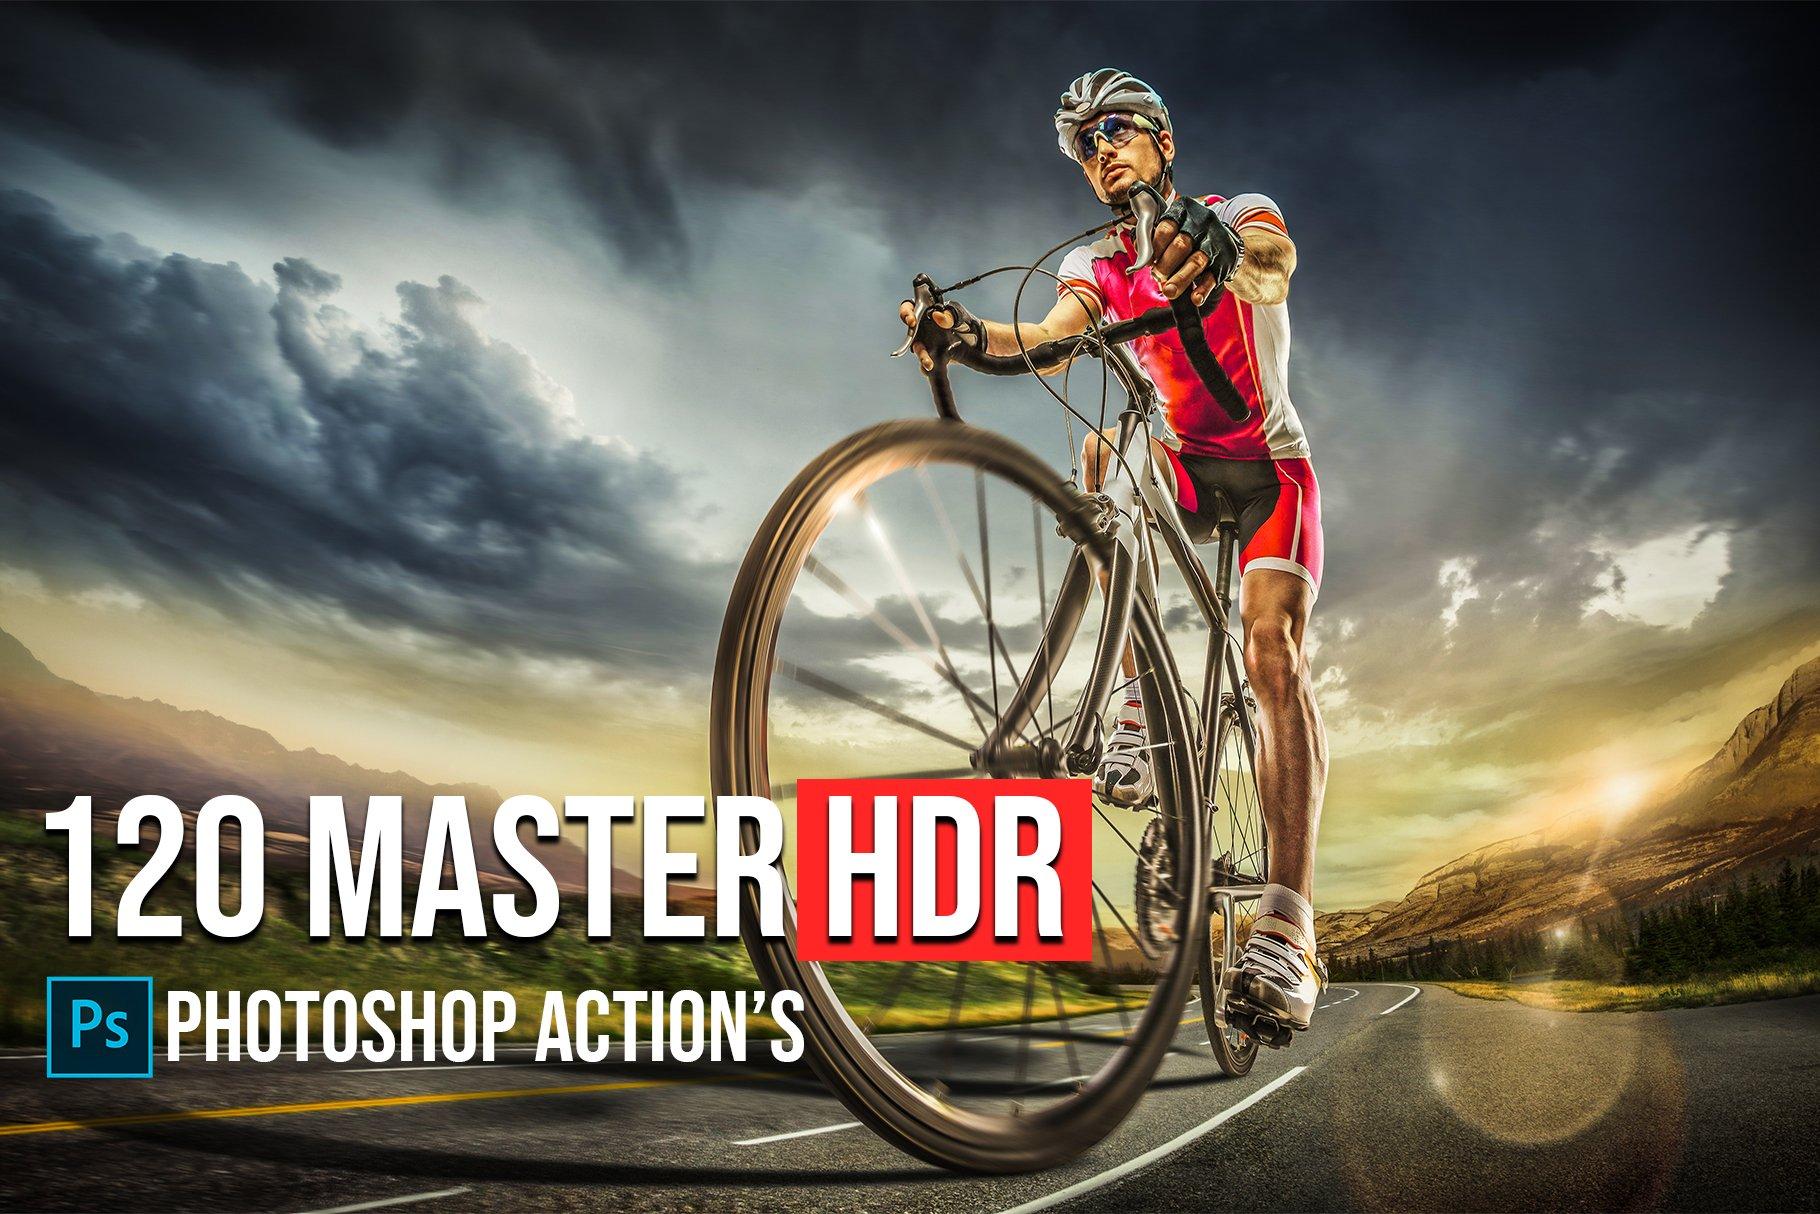 دانلود اکشن فتوشاپ 120 Master HDR